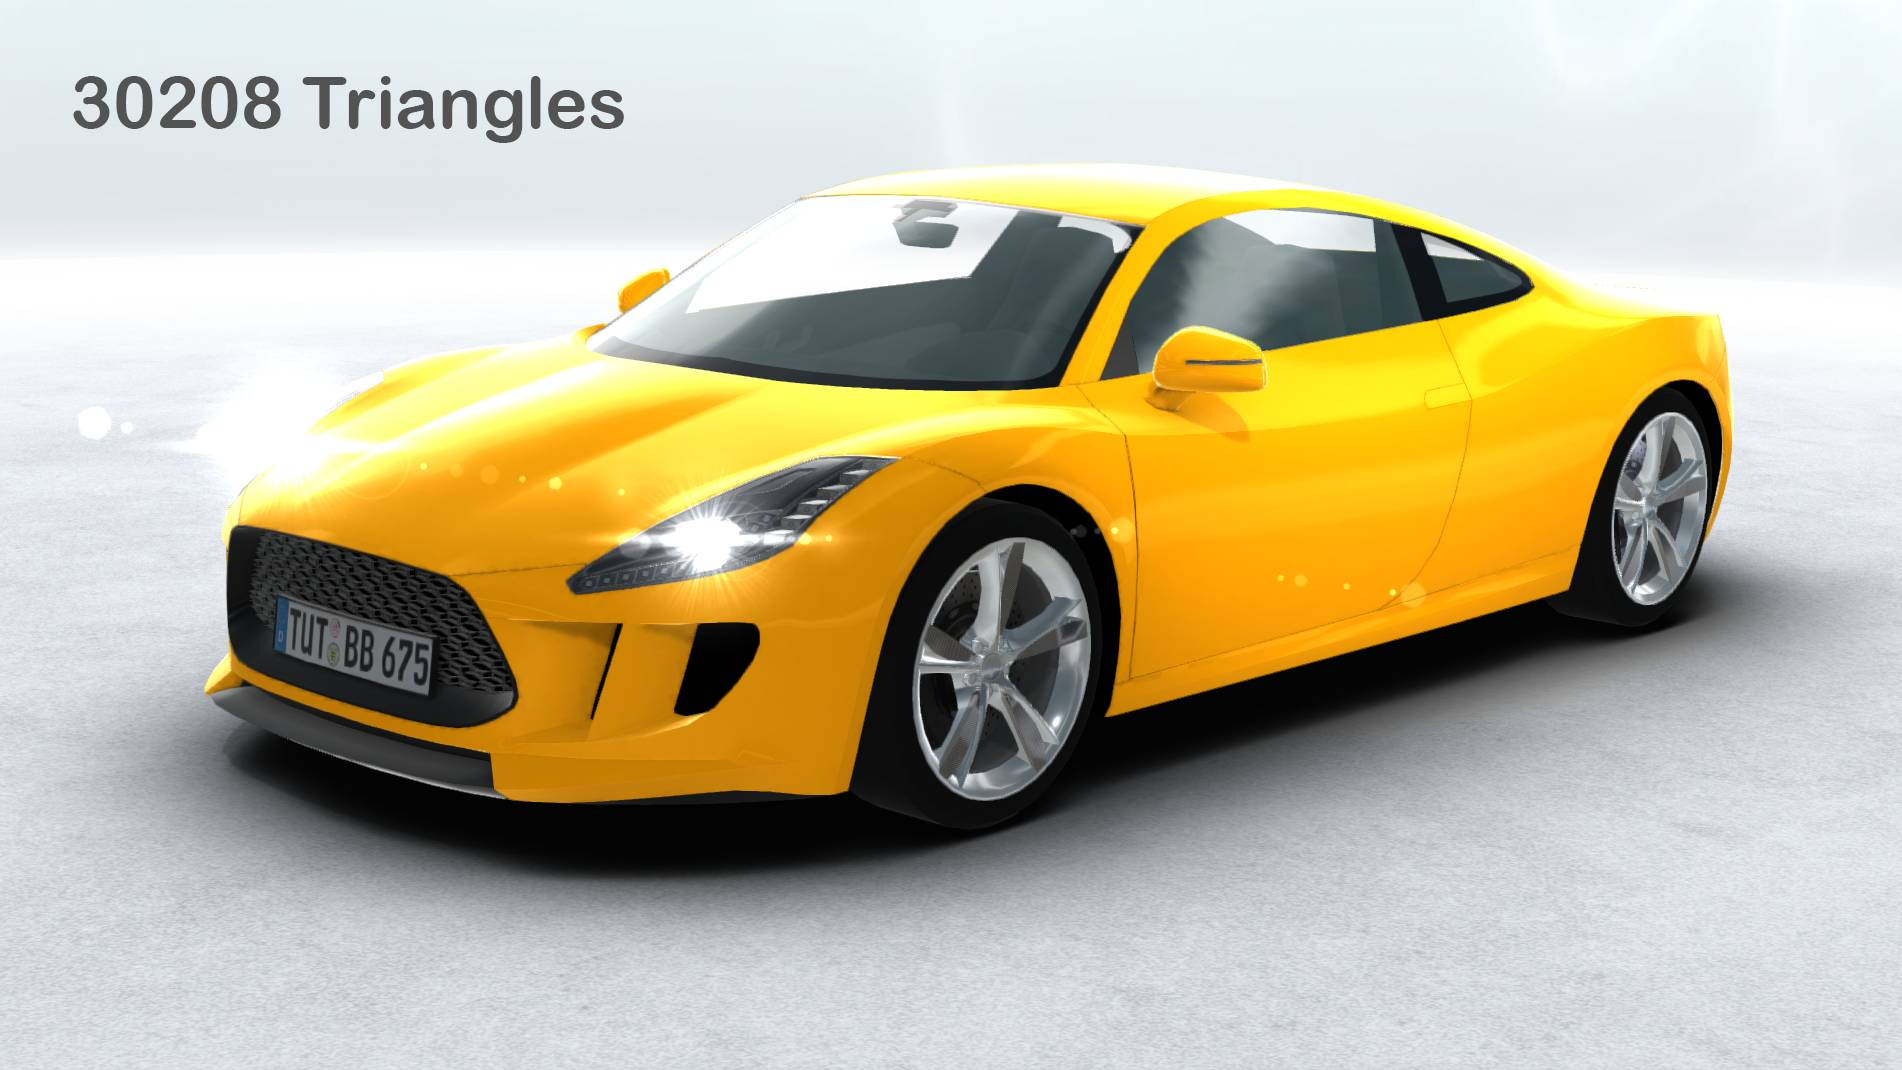 generic sports car realtime 3d model 3ds max fbx c4d lwo ma mb other obj 217742